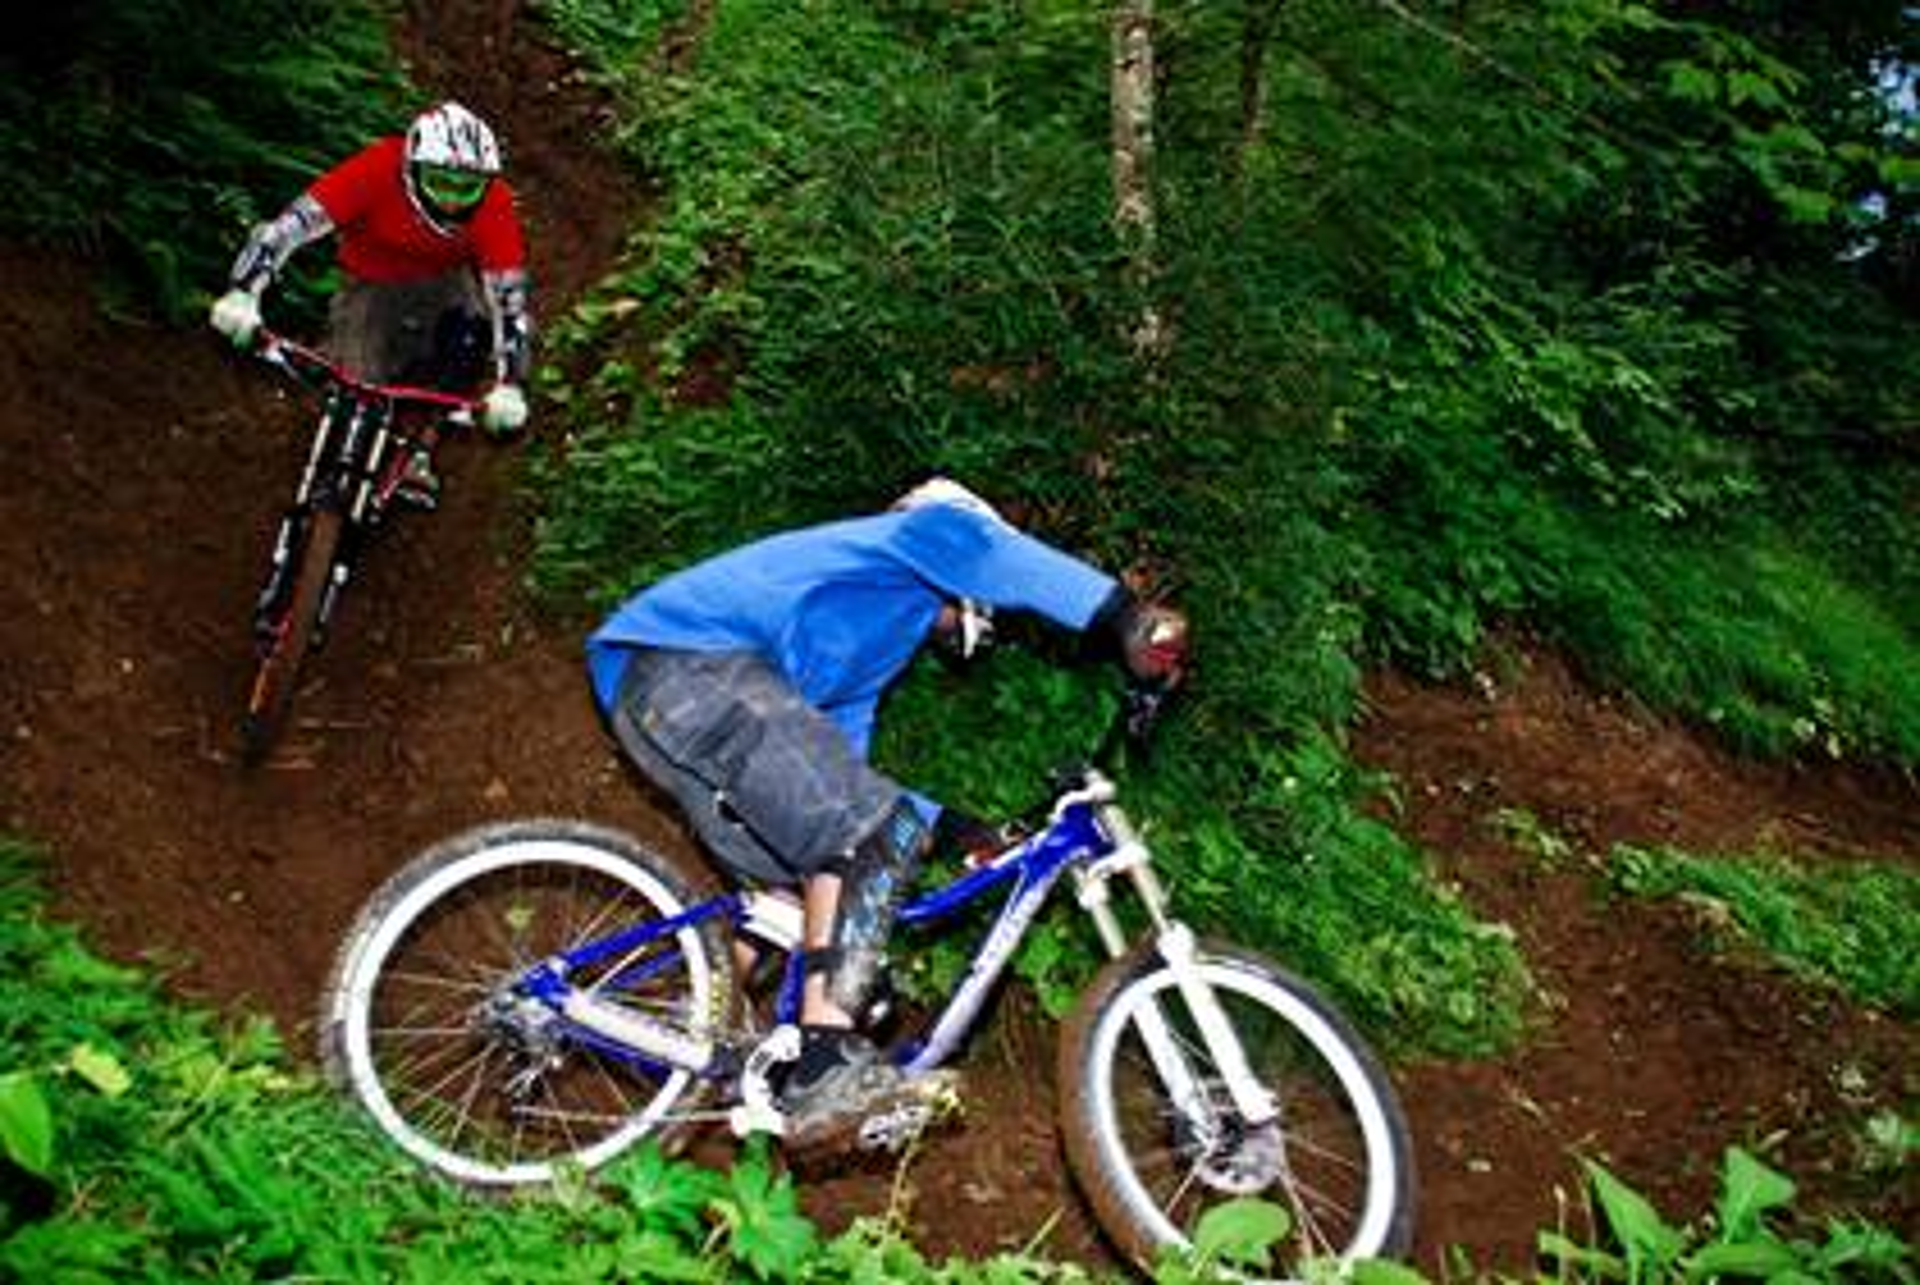 Sunnbuel Freeride Trail